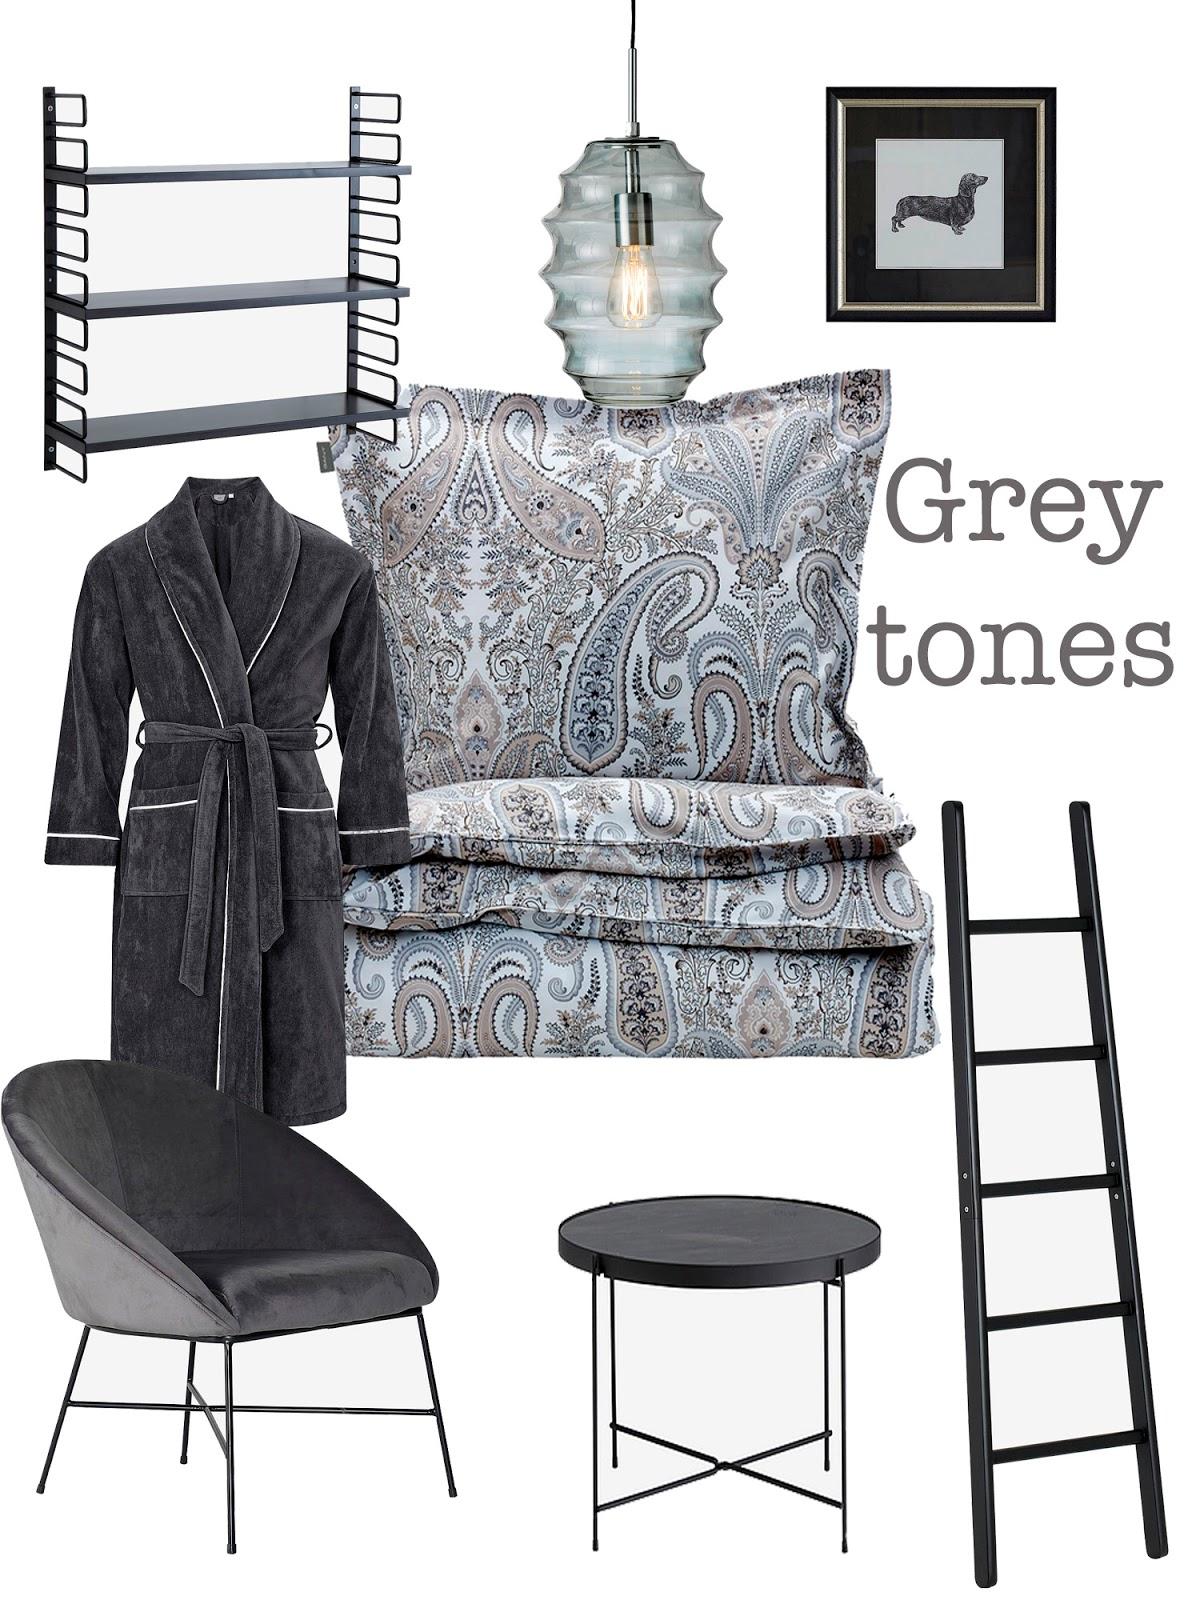 bedroom decor in grey tones